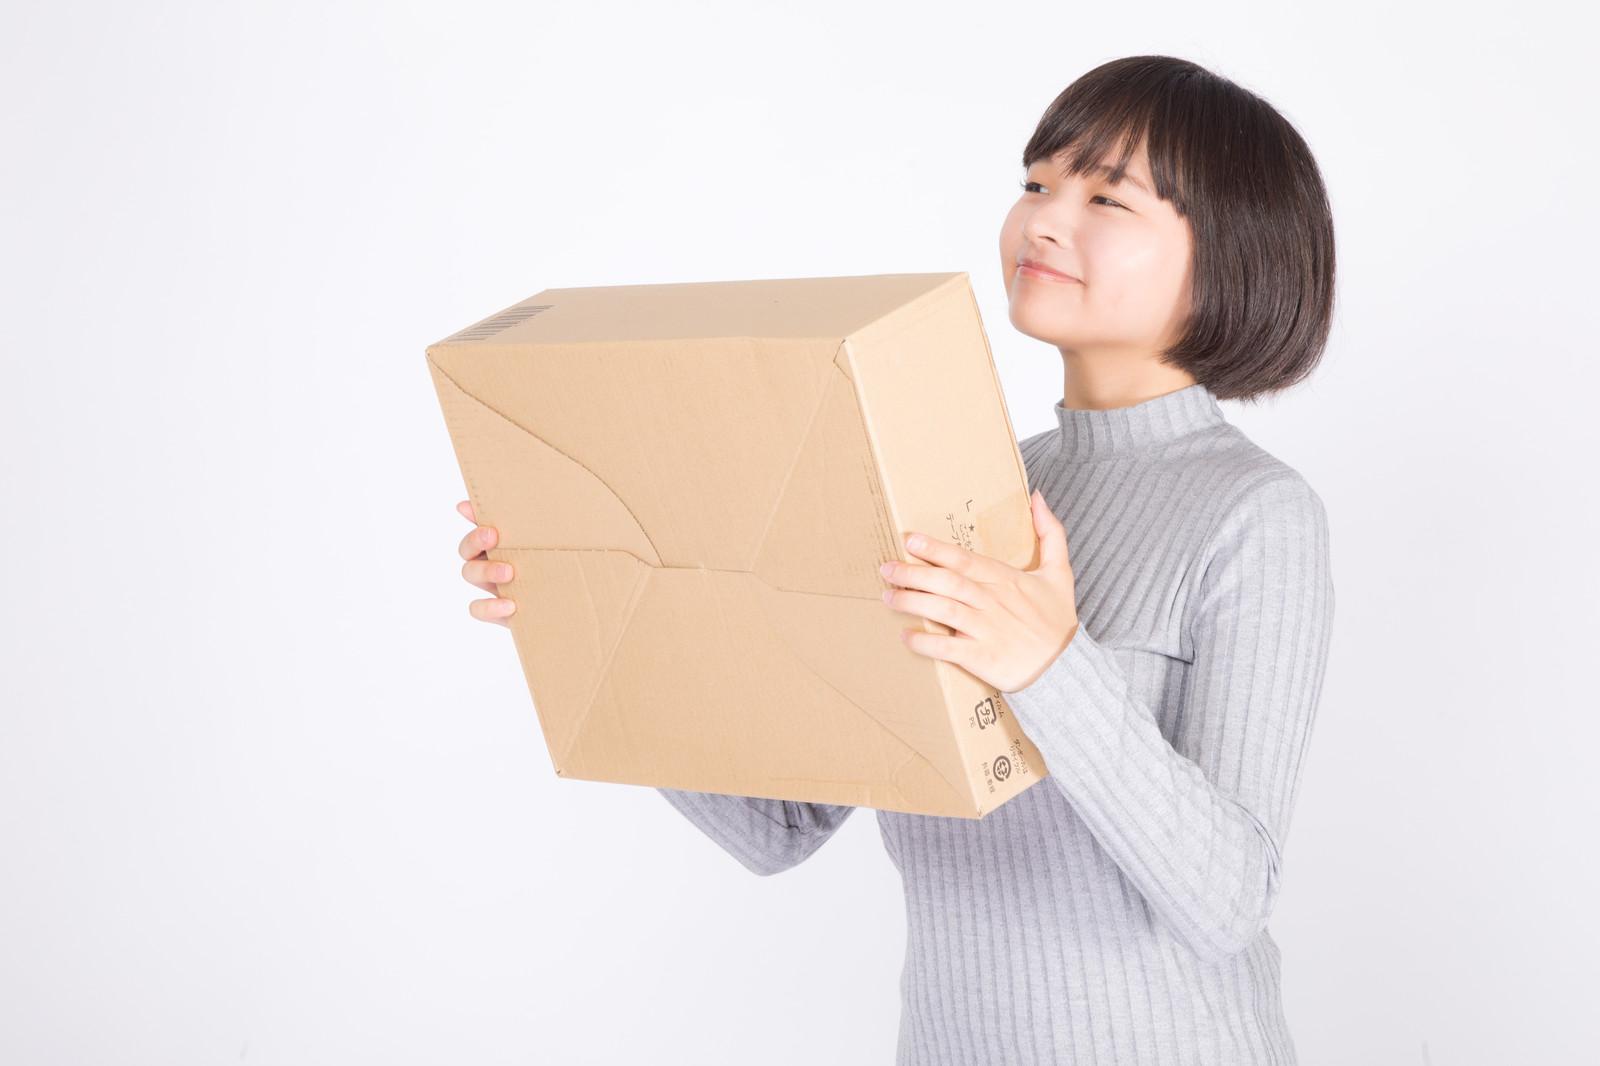 GRL(グレイル)福袋2020福袋の値段や予約開始日は?中身やネタバレ紹介!